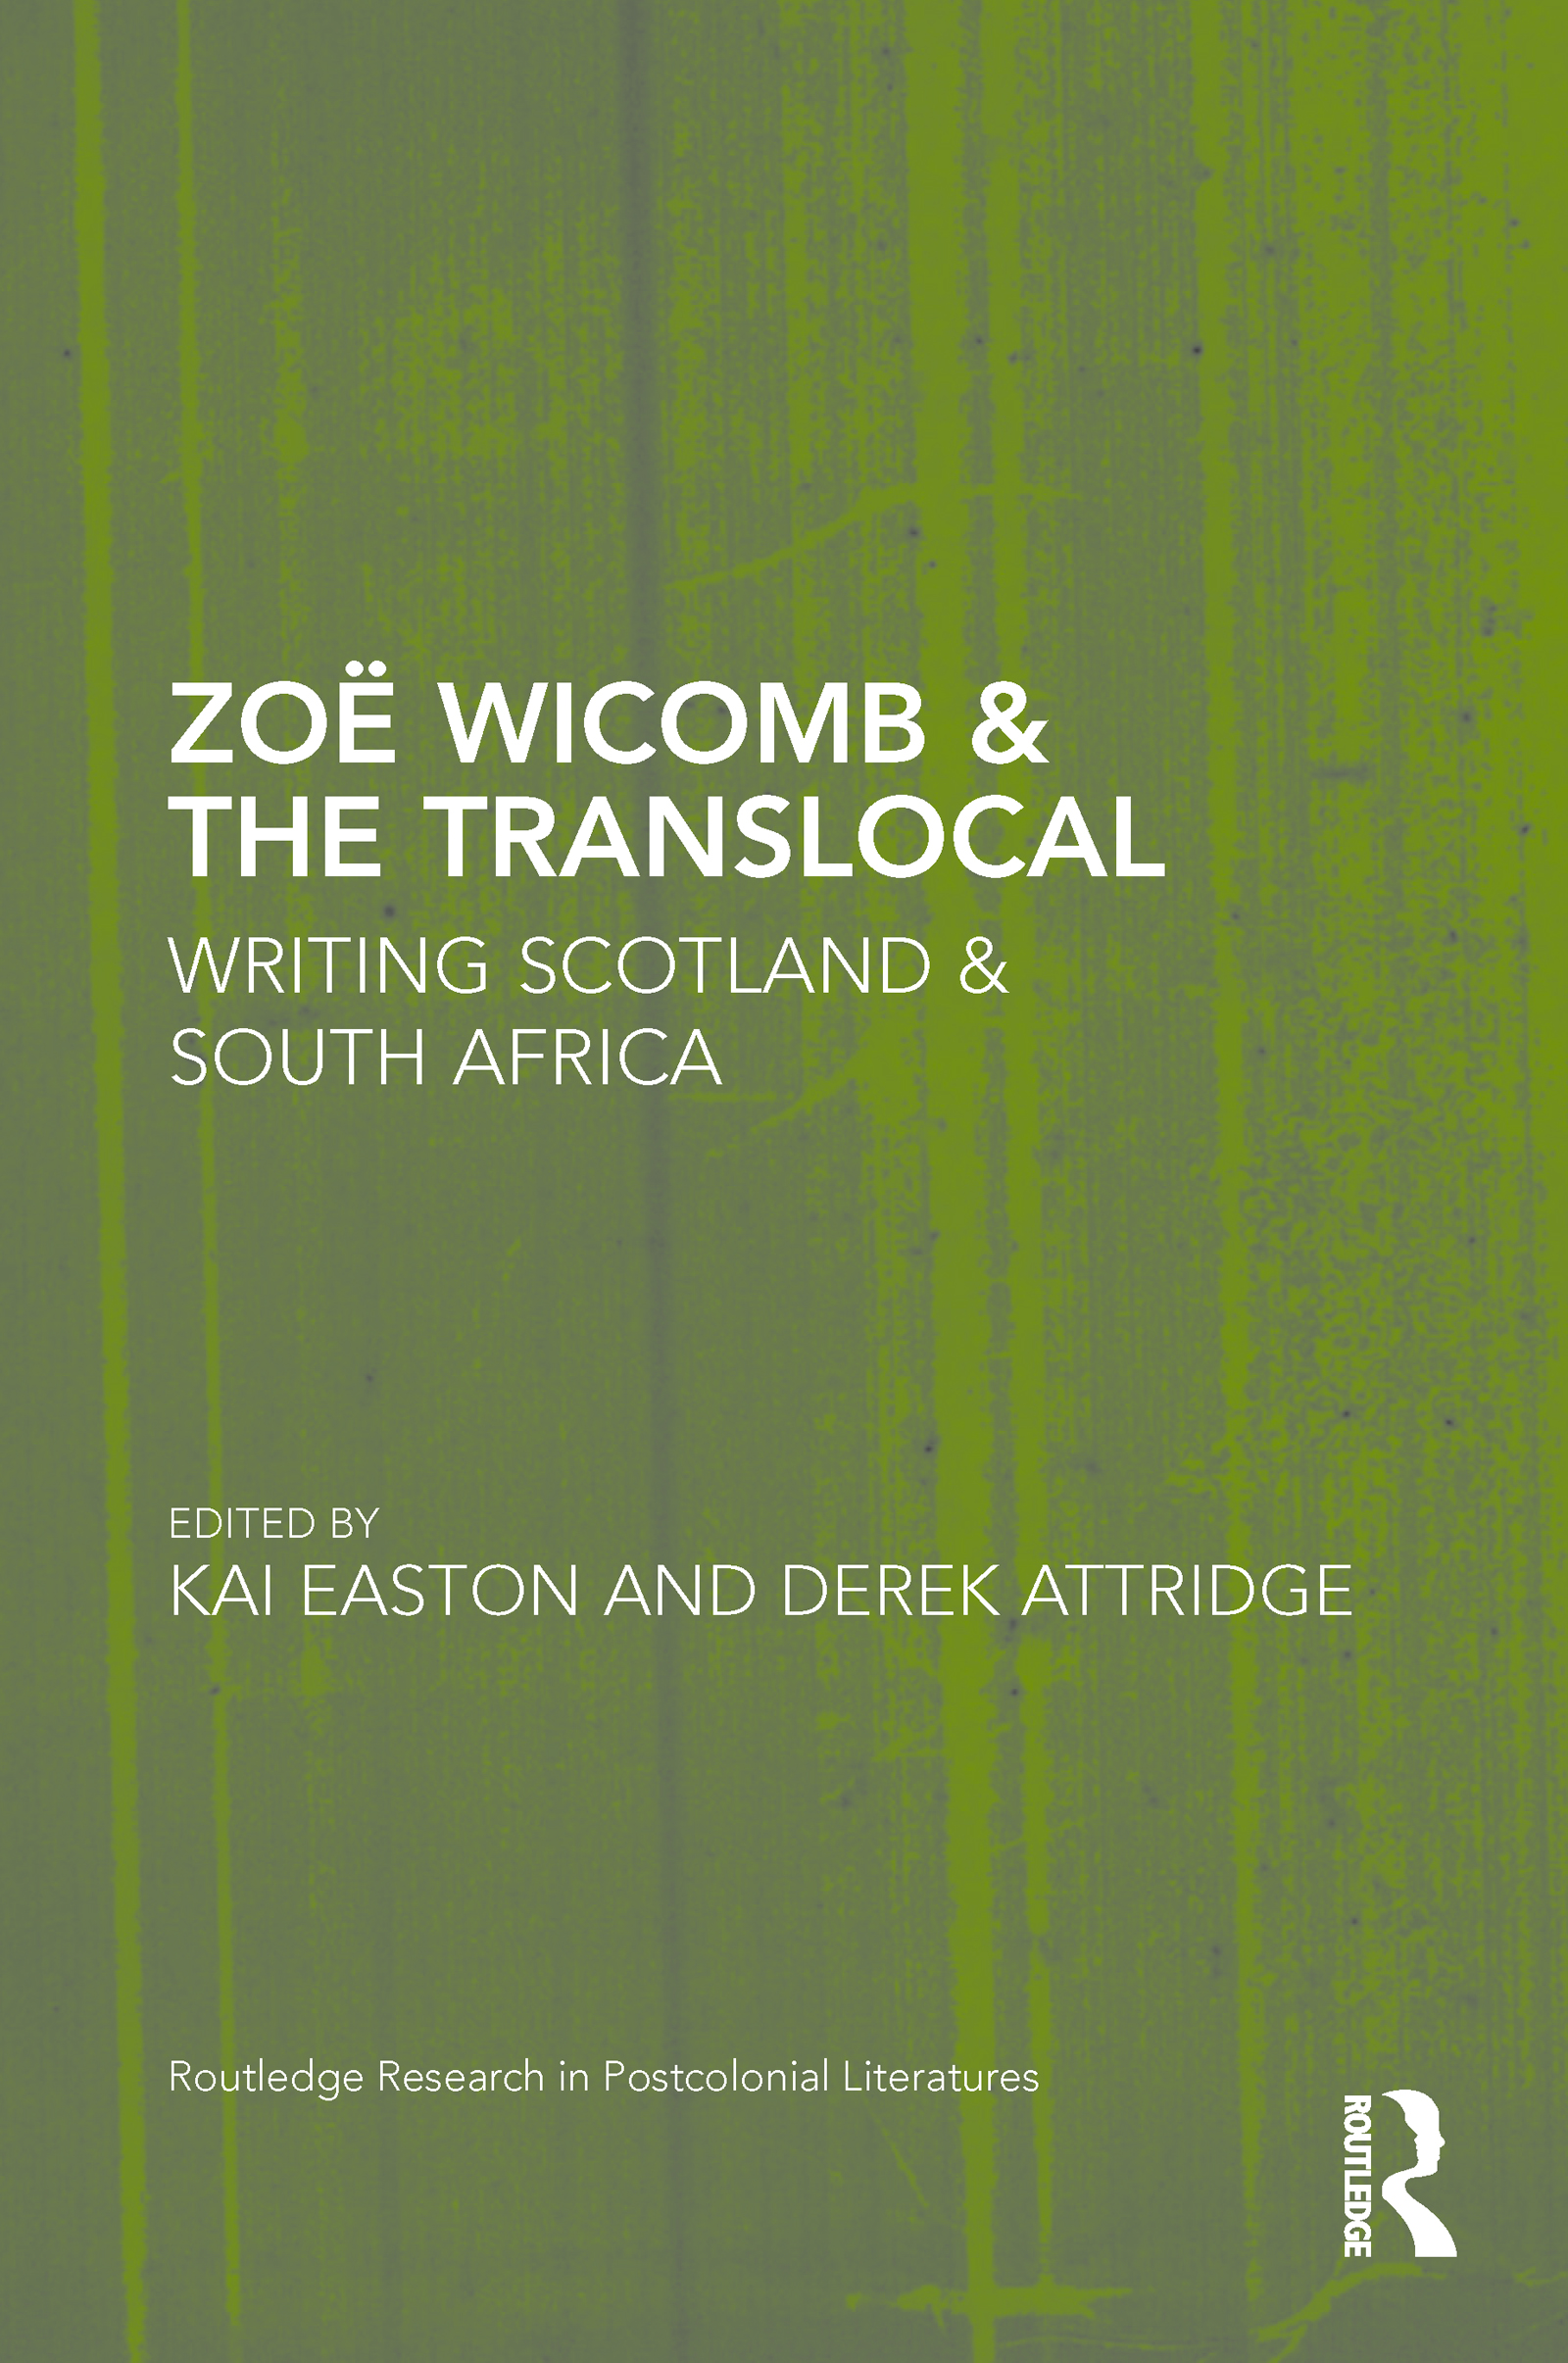 Zoë Wicomb & the Translocal